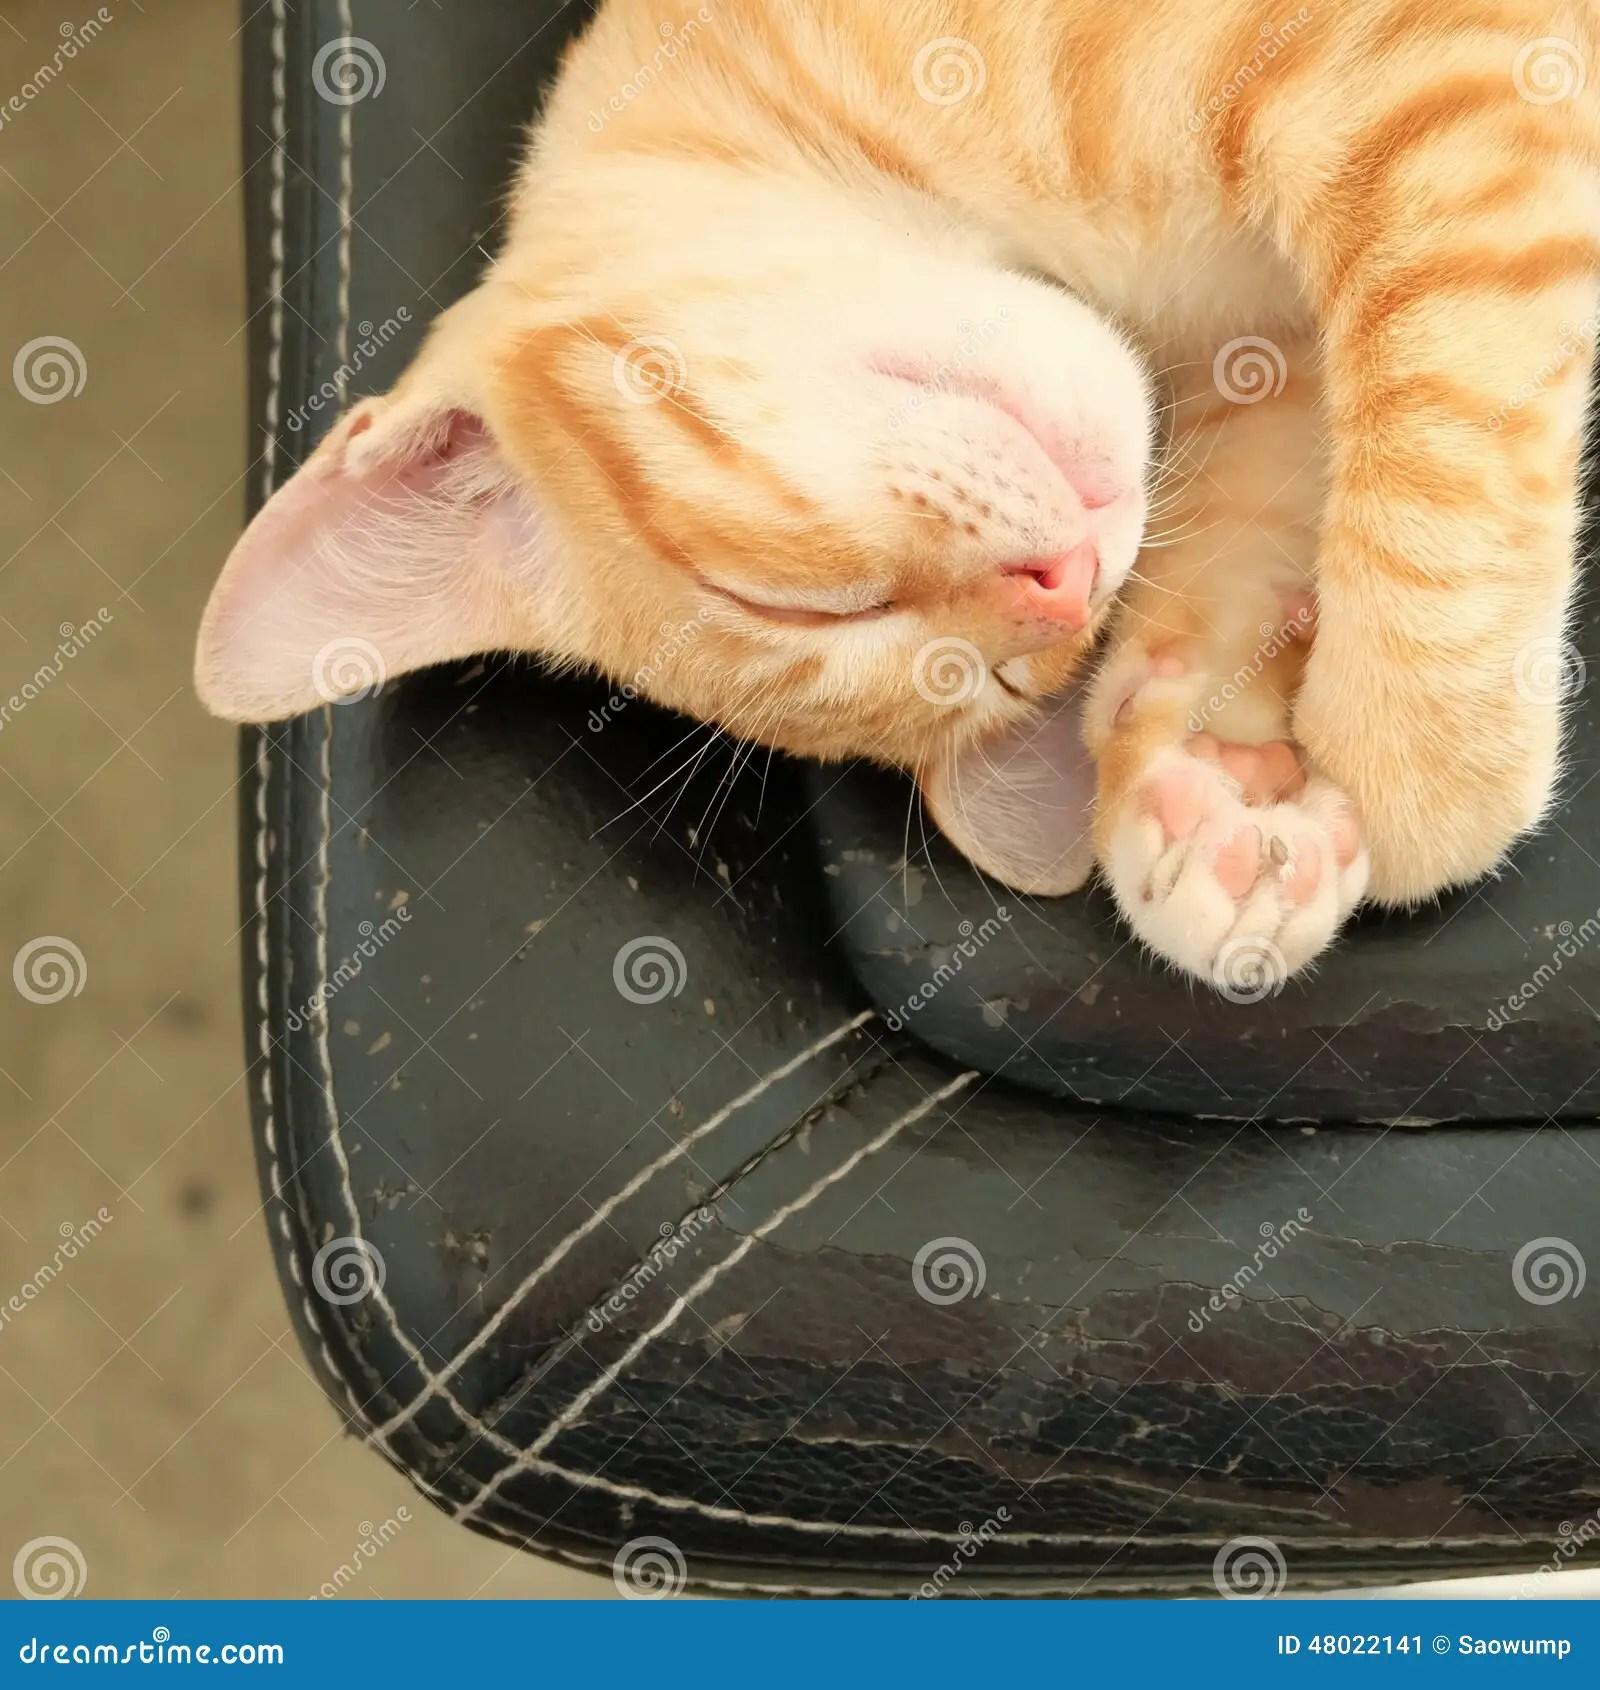 baby sleeping chair strathwood anti gravity cat sleep sweet dream stock image of kitten